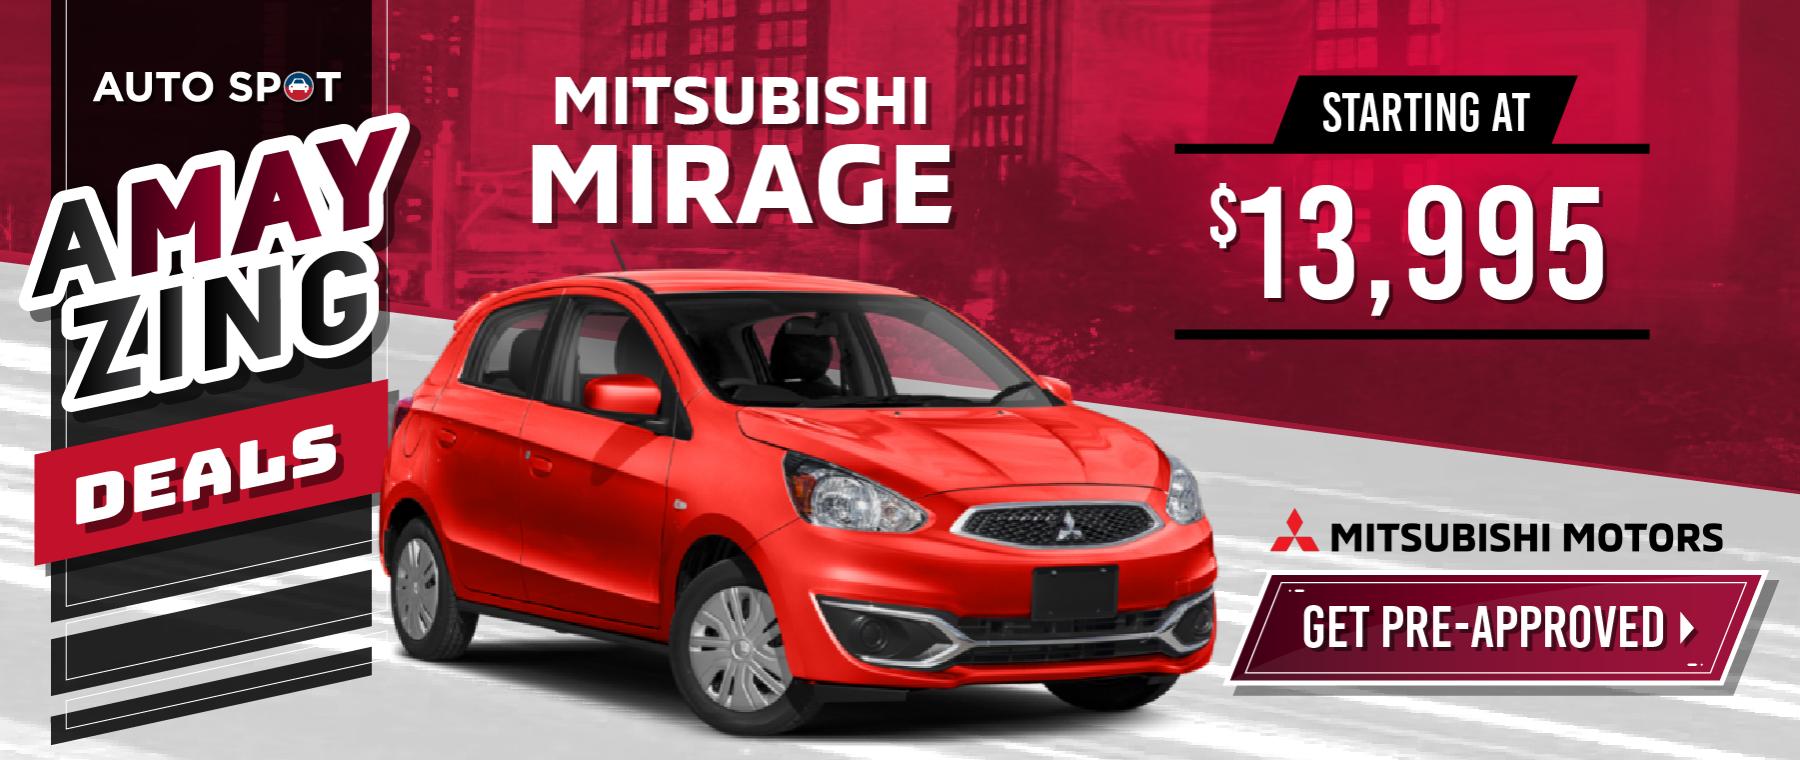 RED Mitsubishi Ads-Amayzing_Web Banner 1800 x 760 px-13995